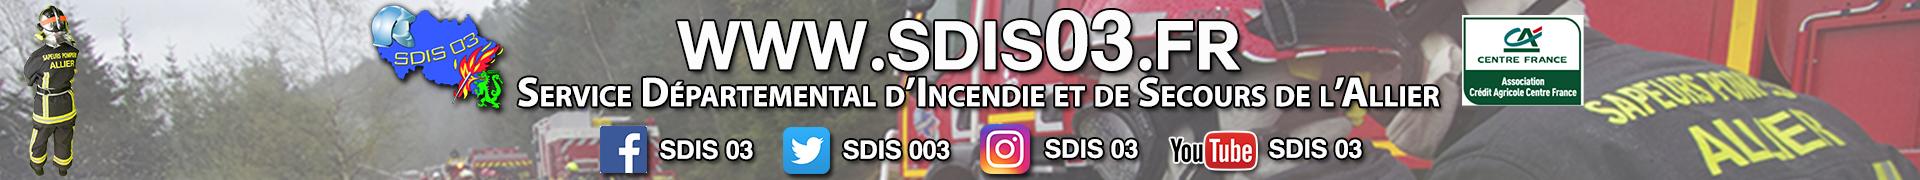 SDIS 03